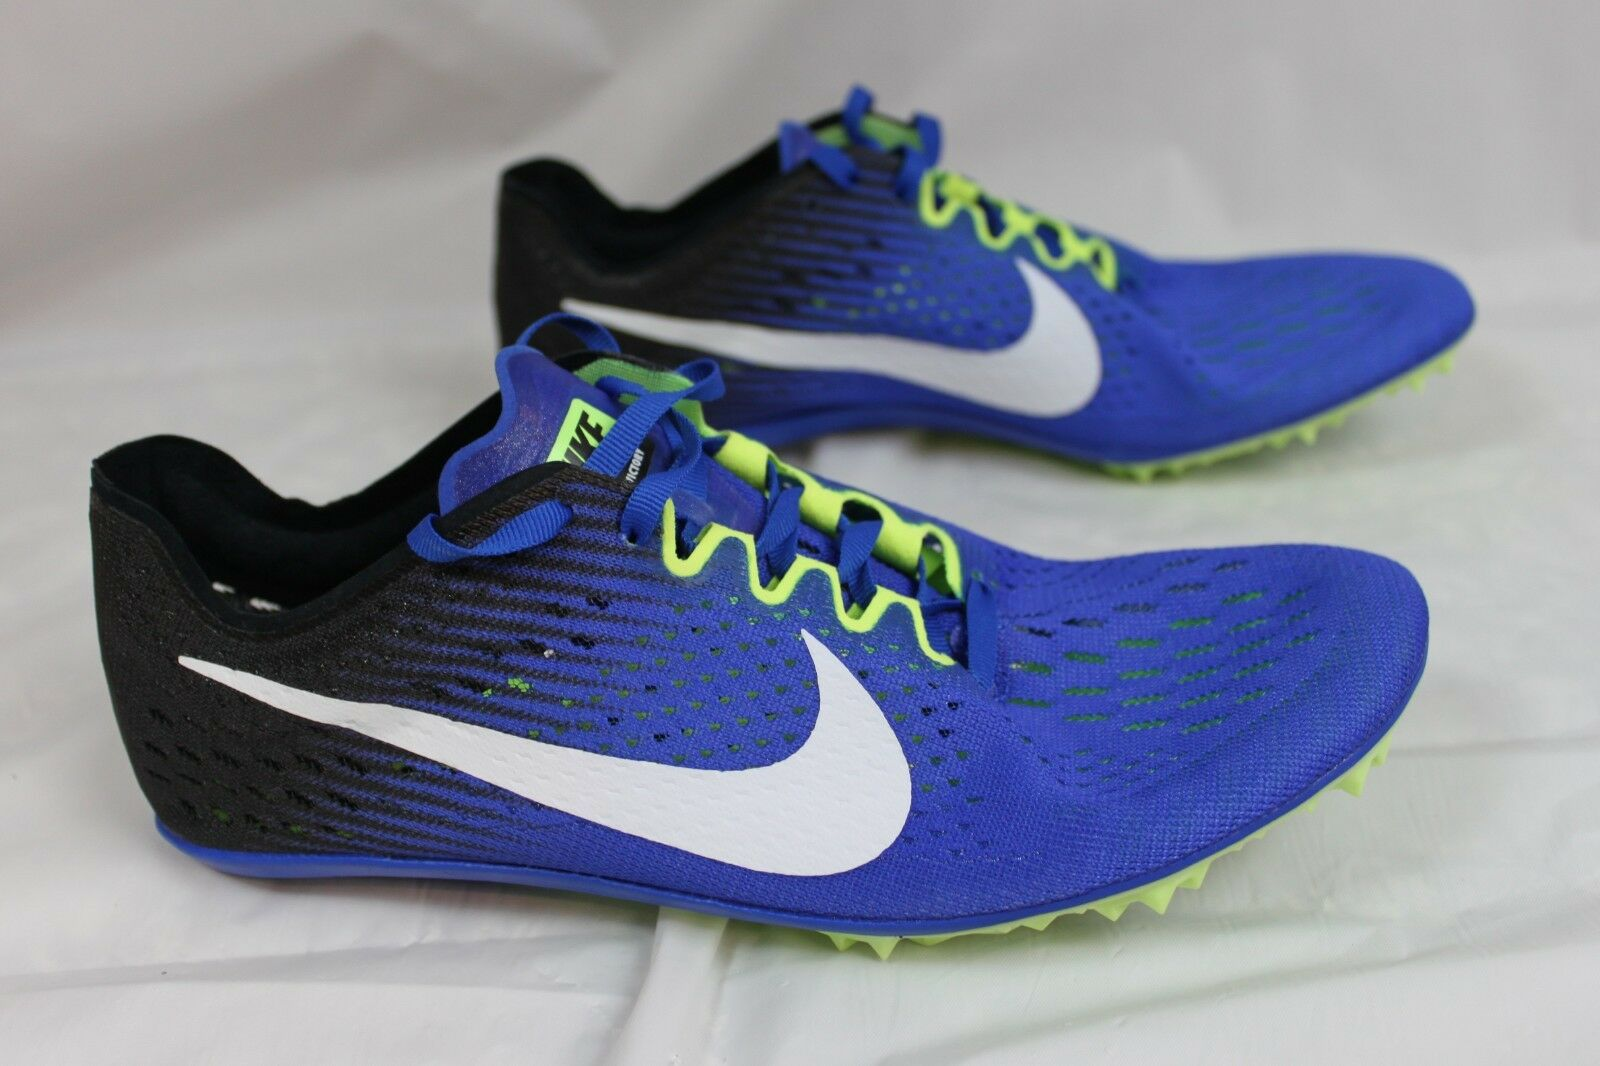 Nike Zoom Victory 8, 3 Distance Pista/XC Zapatos Azul, 7.5, 8, Victory 10, 12, con picos! 2d7c3a